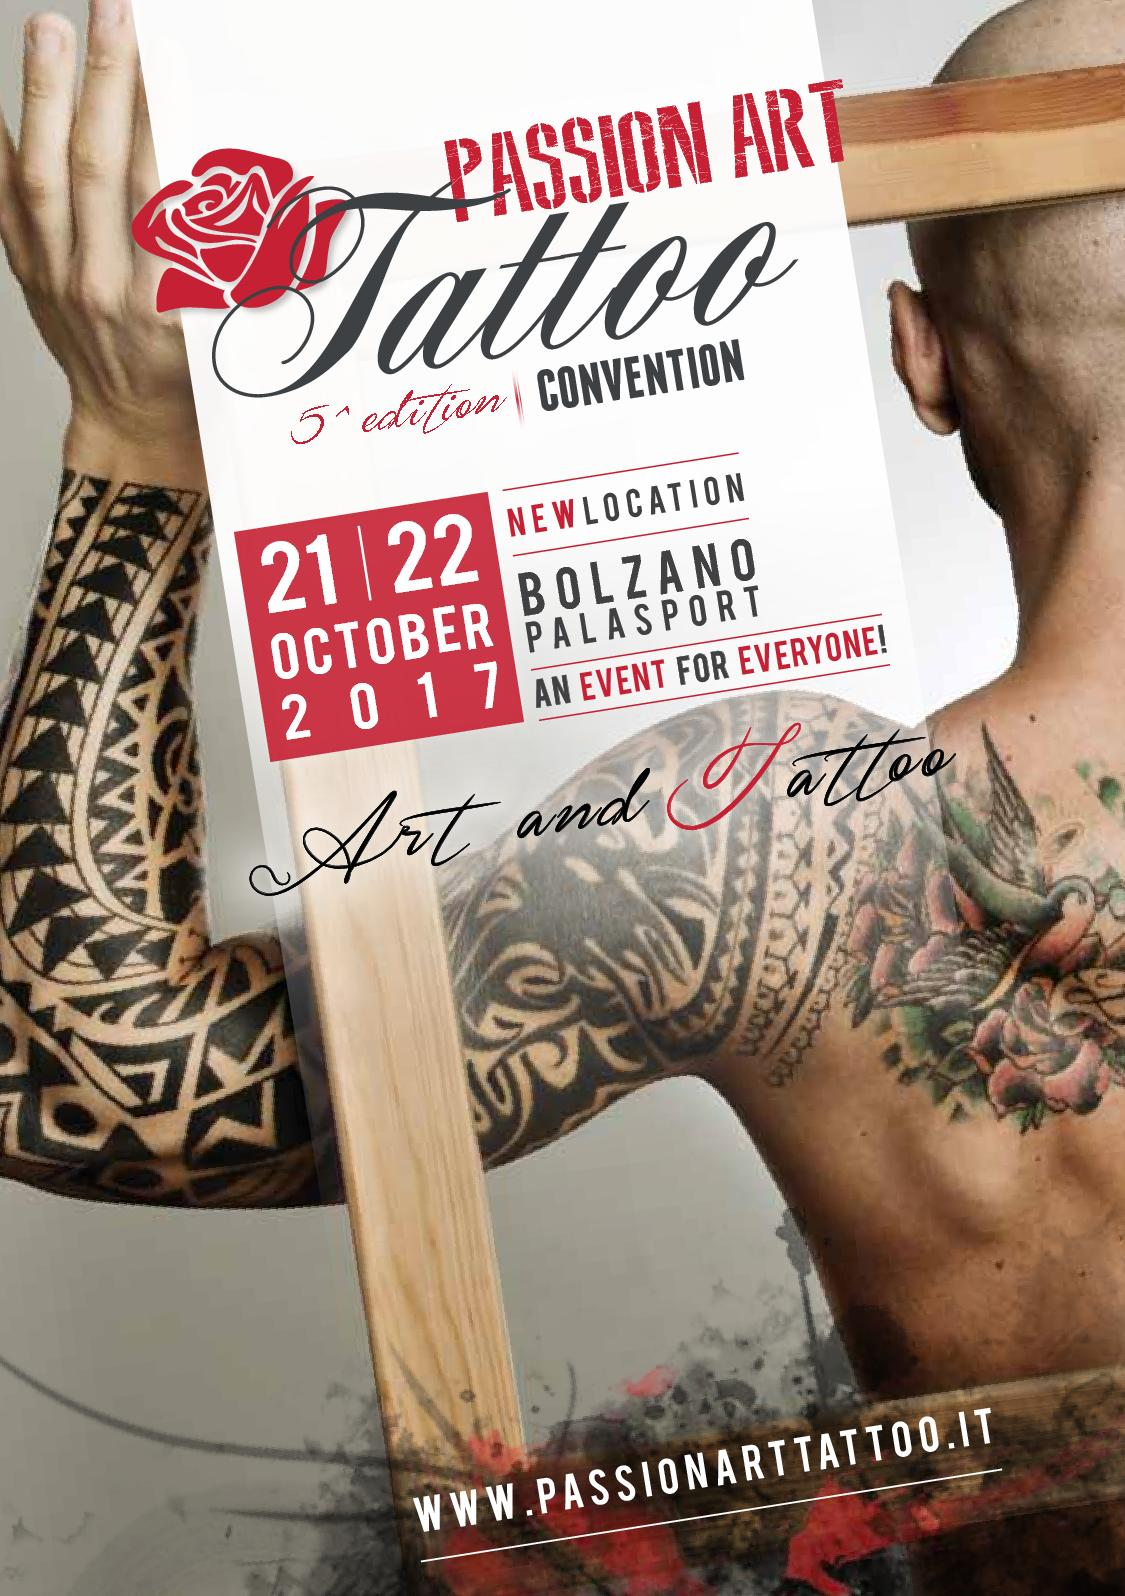 Catalogo Tattoo 2017 catalogo passion art tattoo bz 2017 - calameo downloader